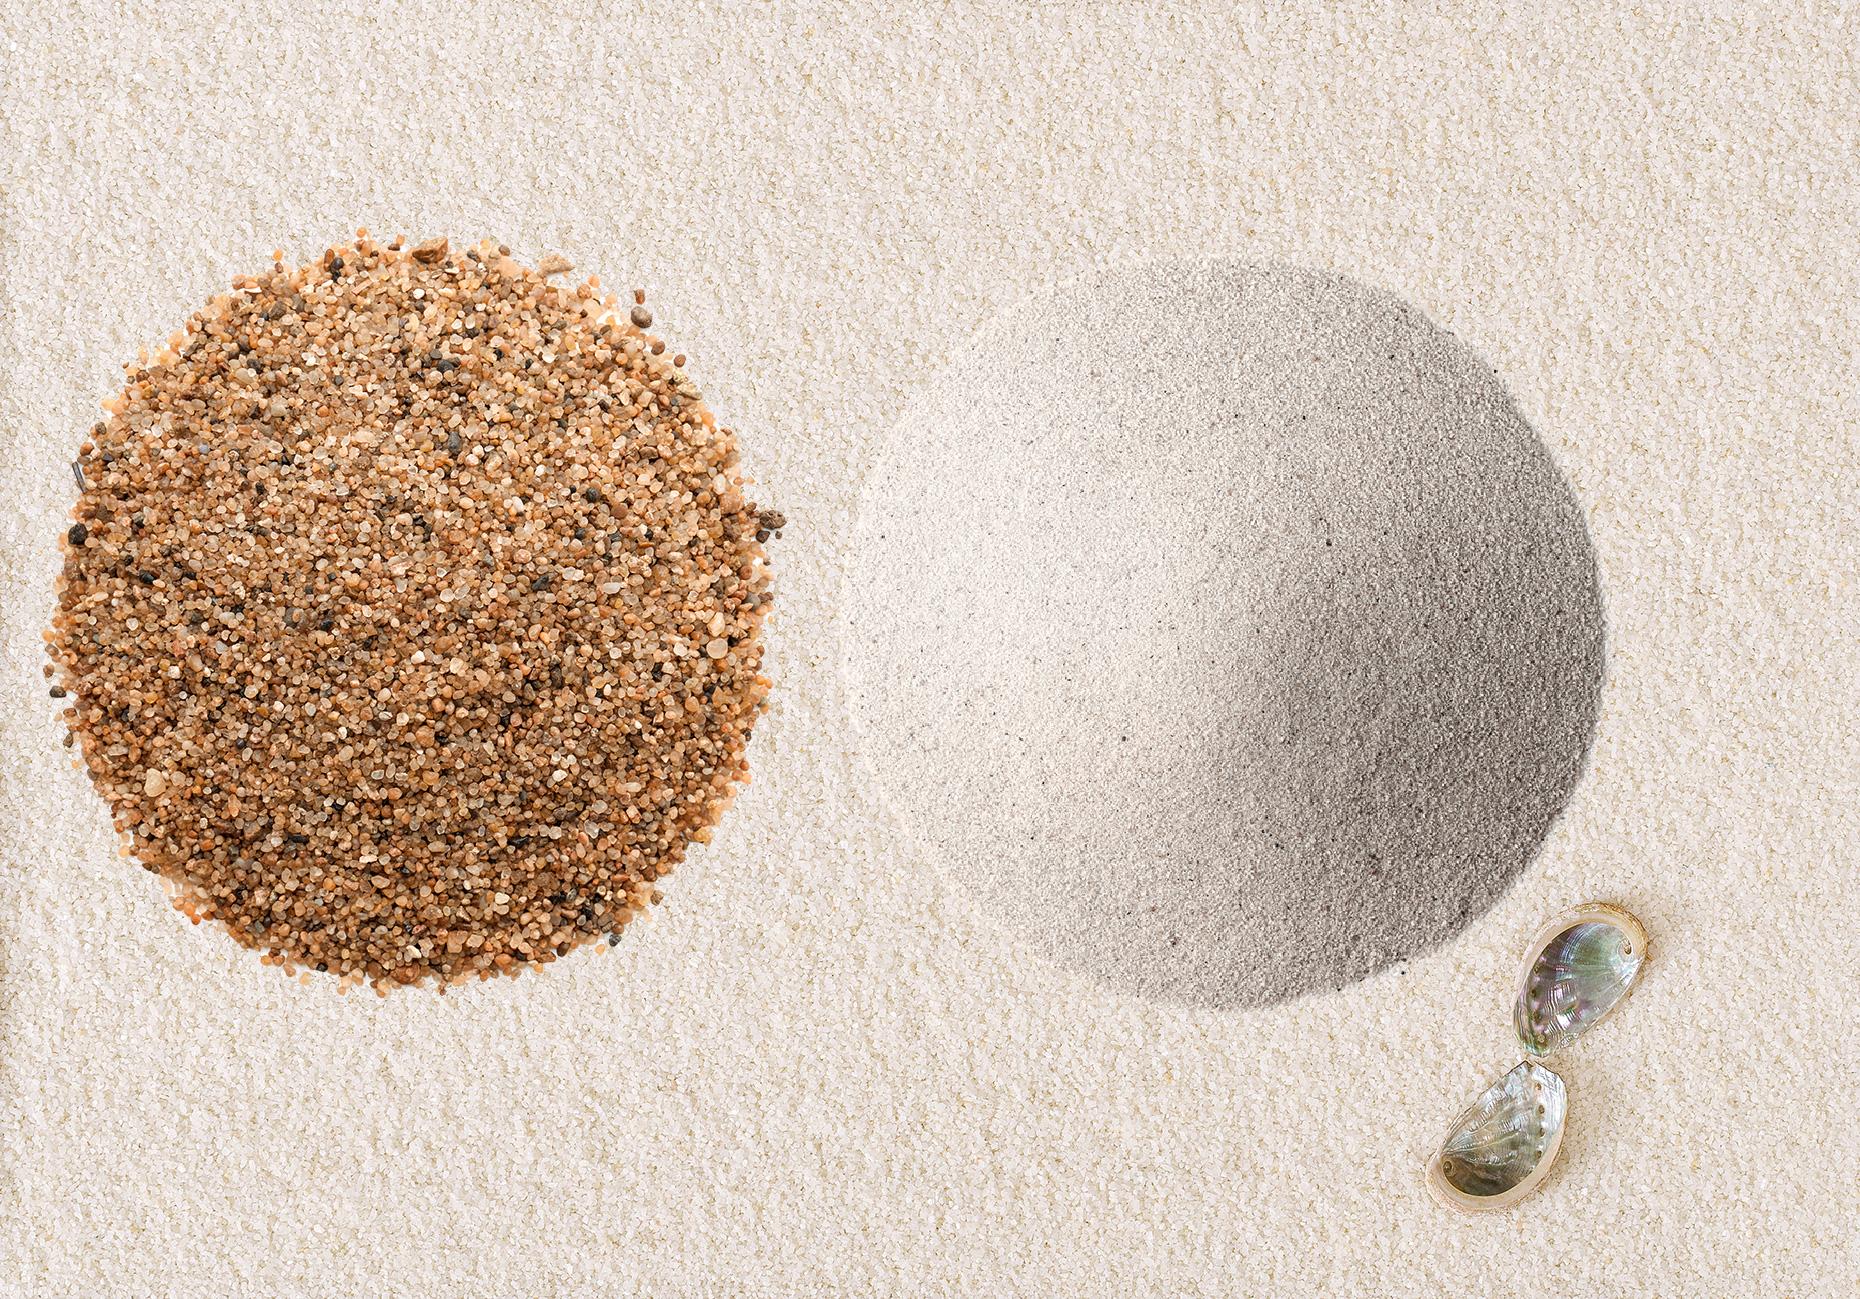 Quartz Sand Suppliers